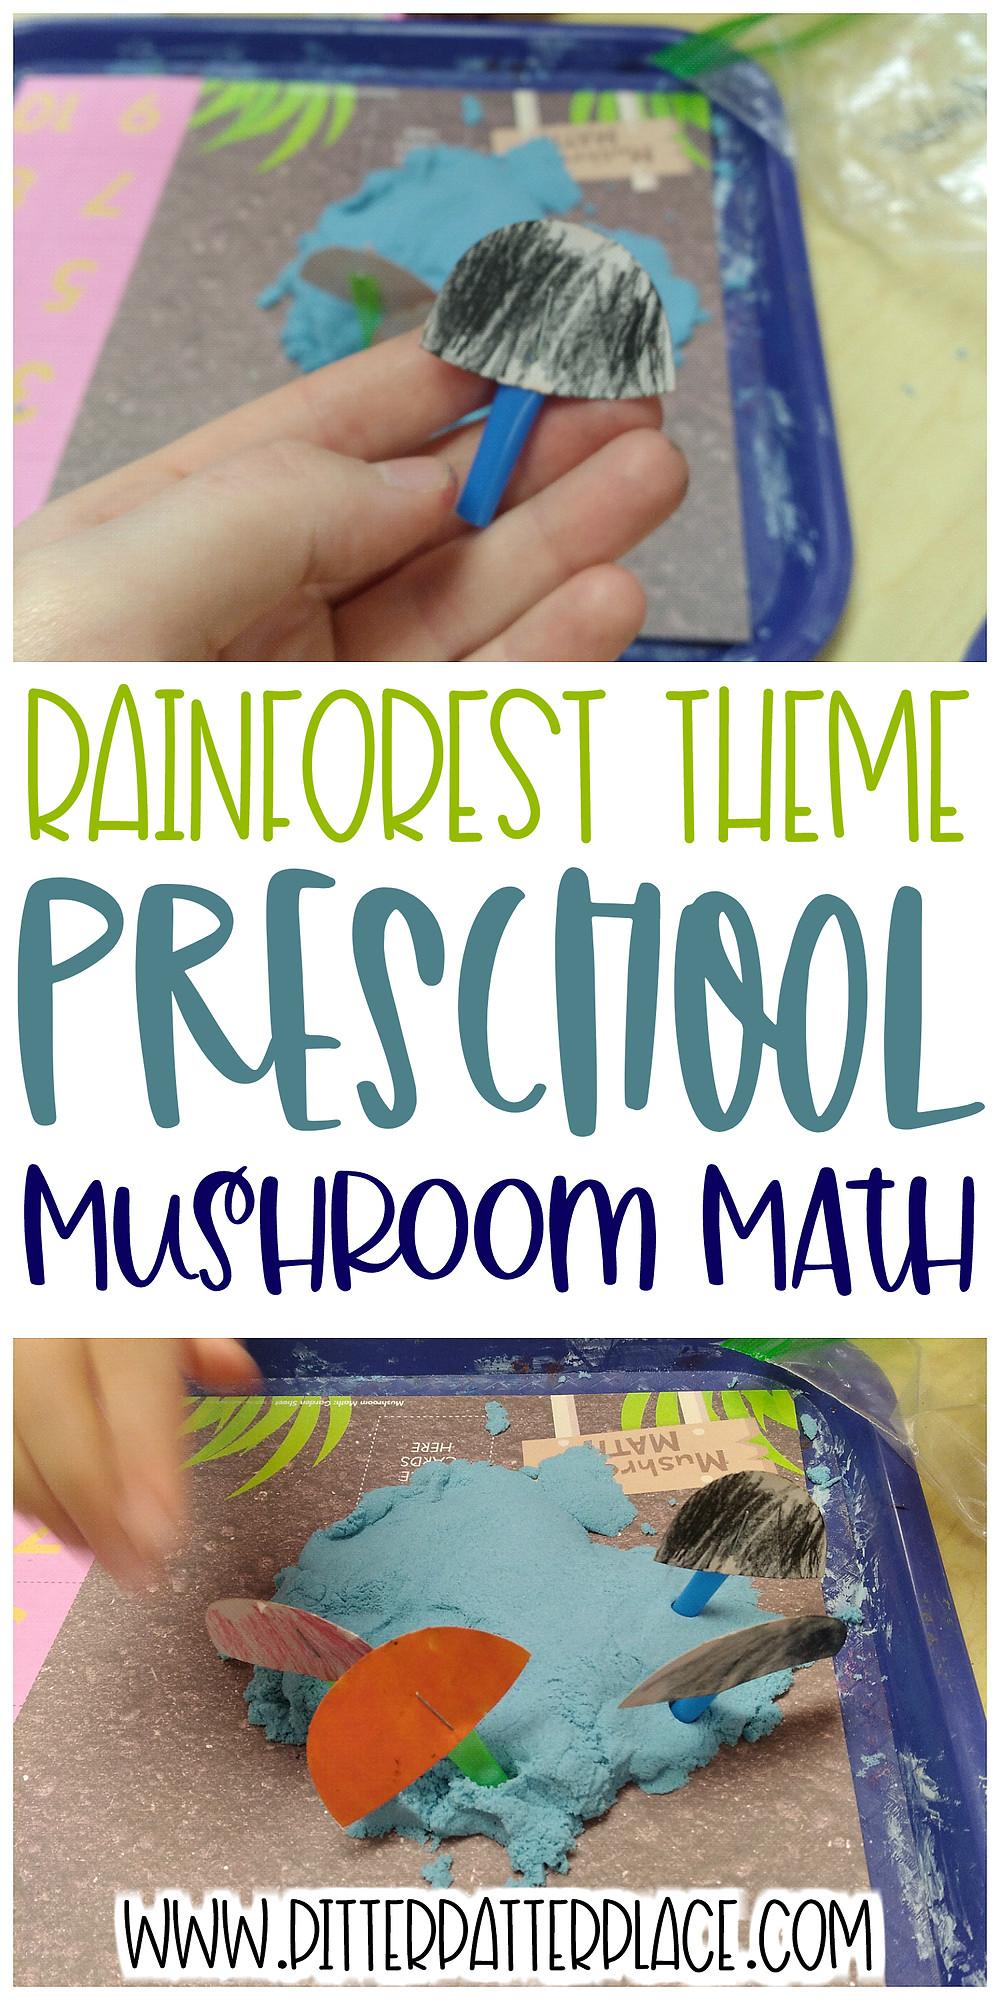 collage of Mushroom Math images with text: Rainforest Theme Preschool Mushroom Math